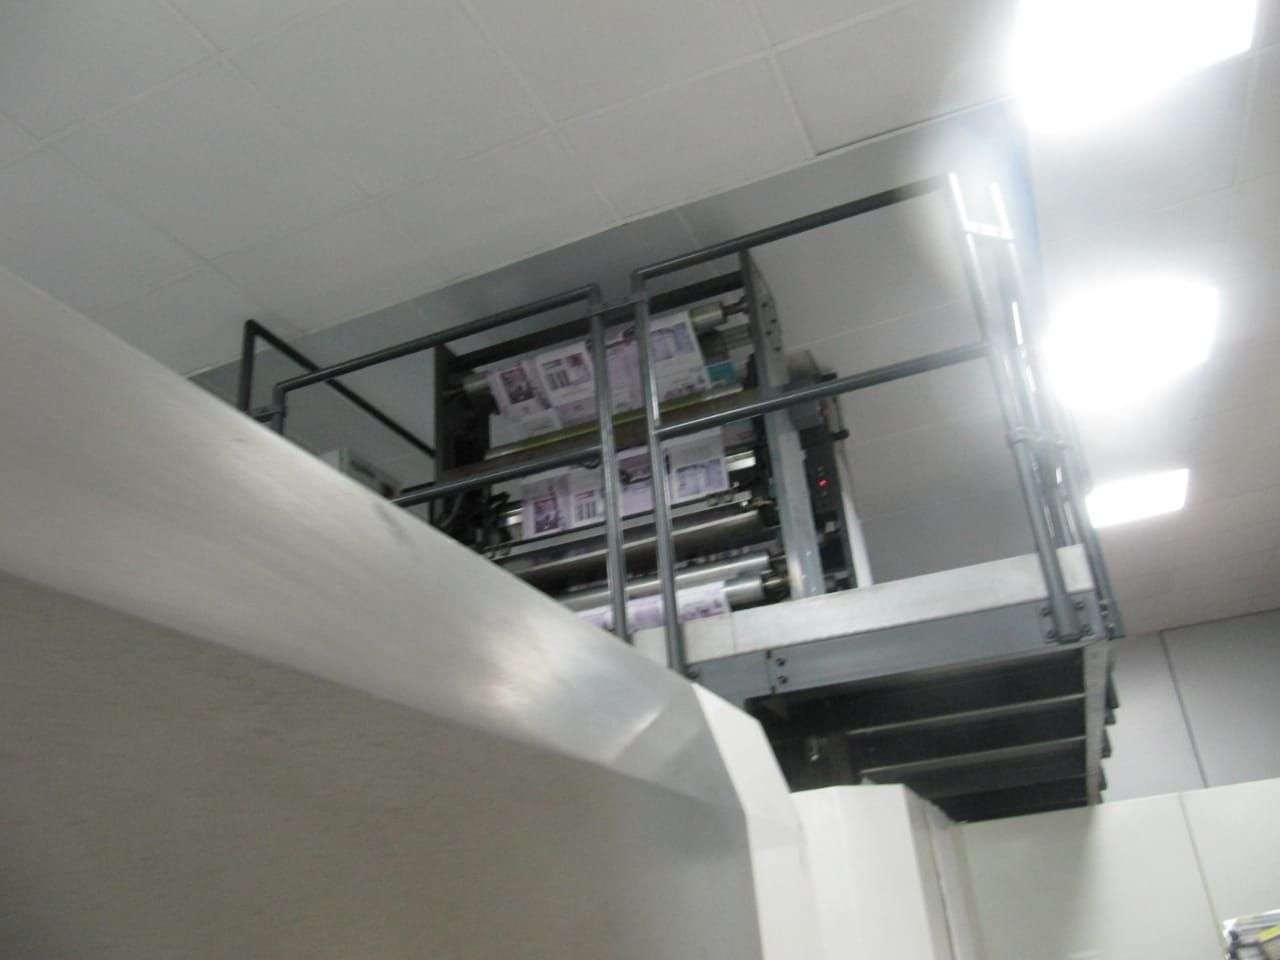 KOMORI SYSTEM 38 S, Jahr : 2011, ref.68788 | www.coci-sa.com/de | 68788n_2.jpg